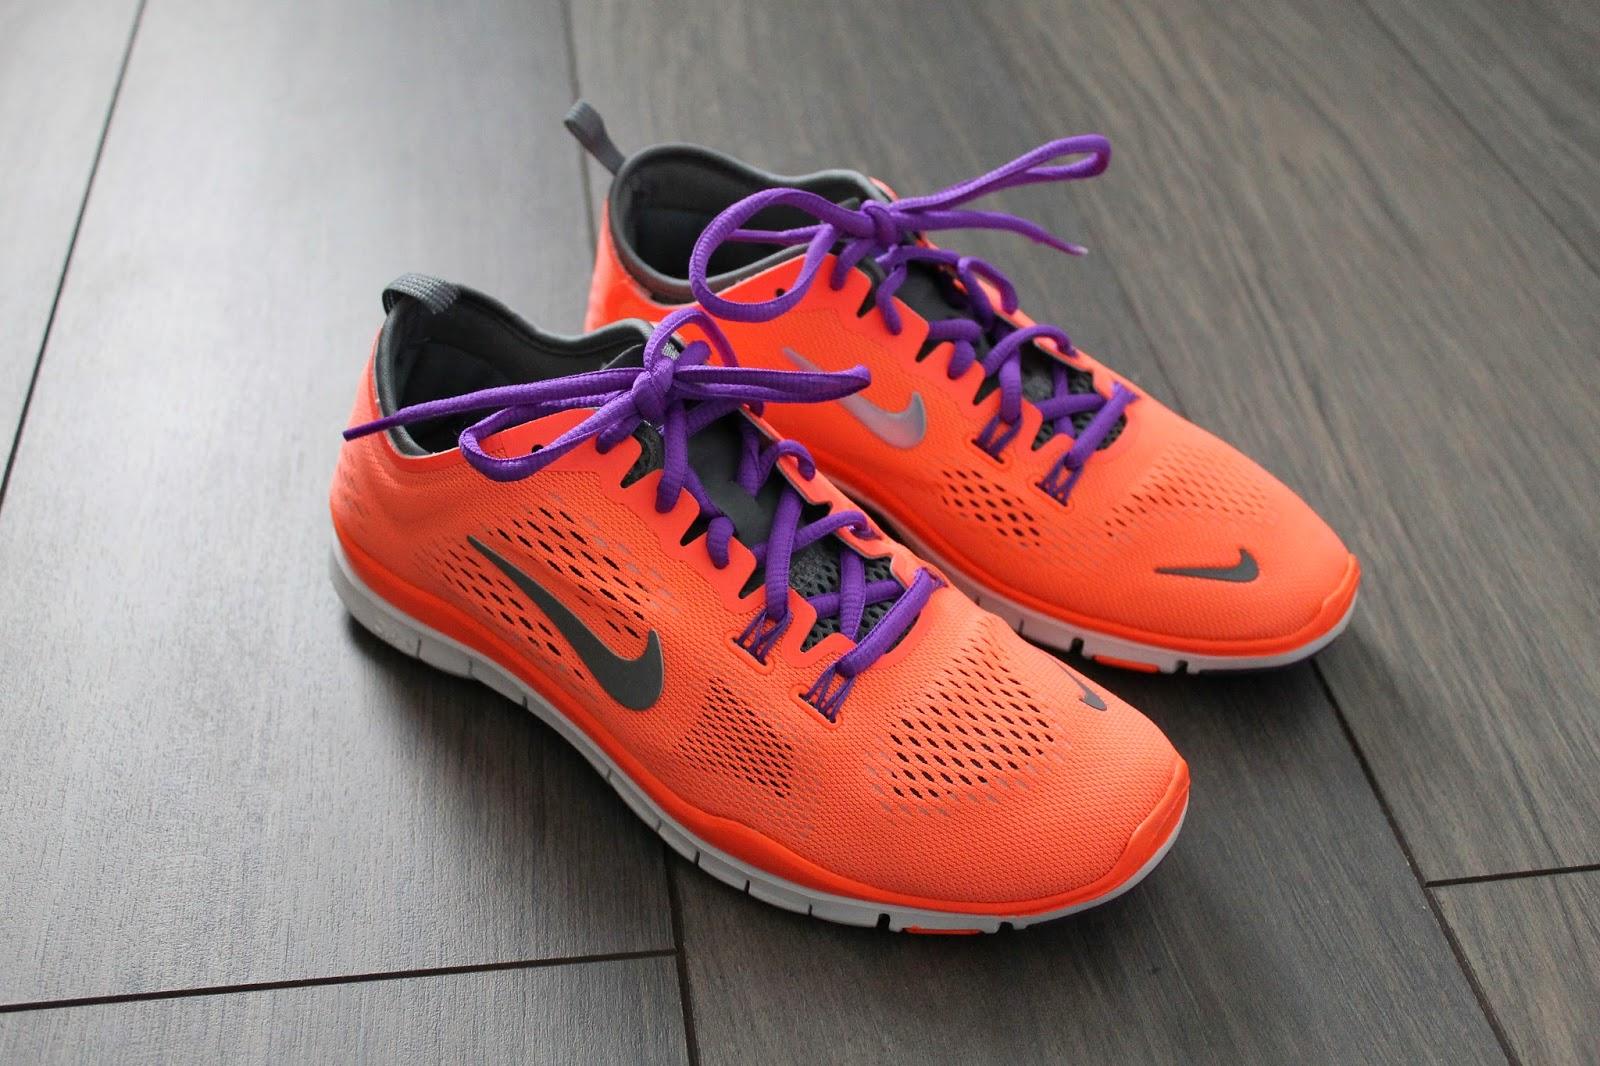 Muotioikku Shoes Muotioikku New New Training Training FY56qTx